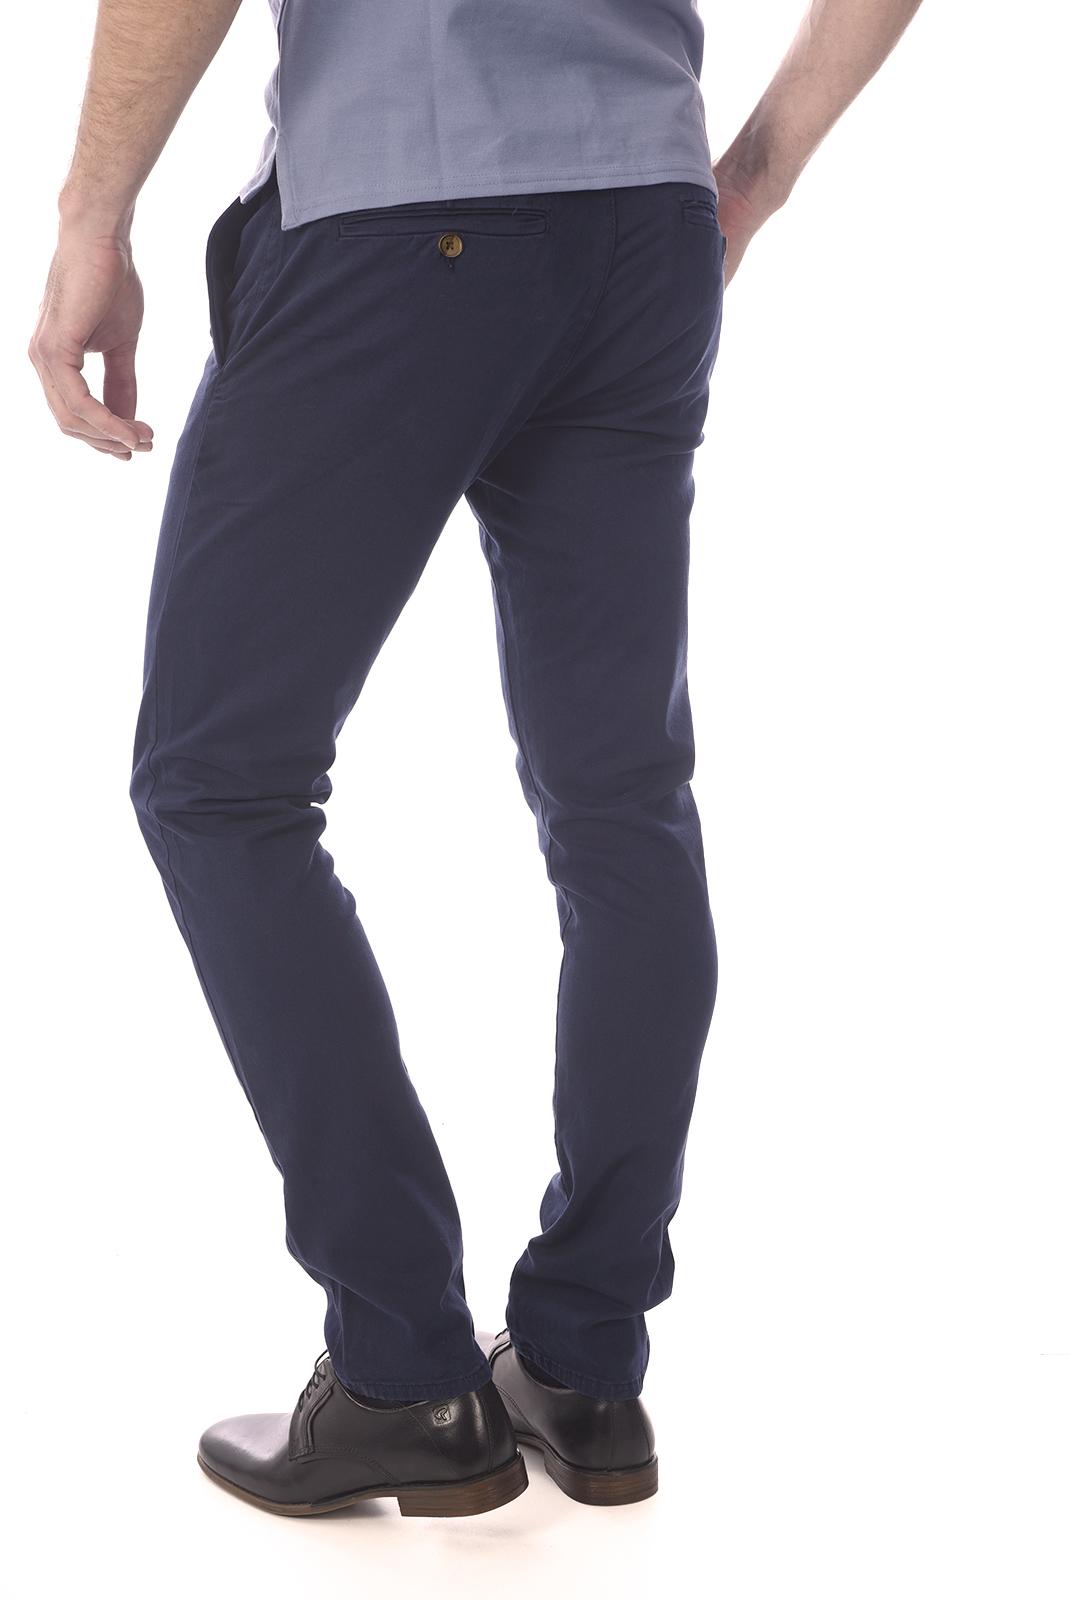 Pantalons chino/citadin  Guess jeans M84B29 WAM20 DANIEL G720 BLUE NAVY